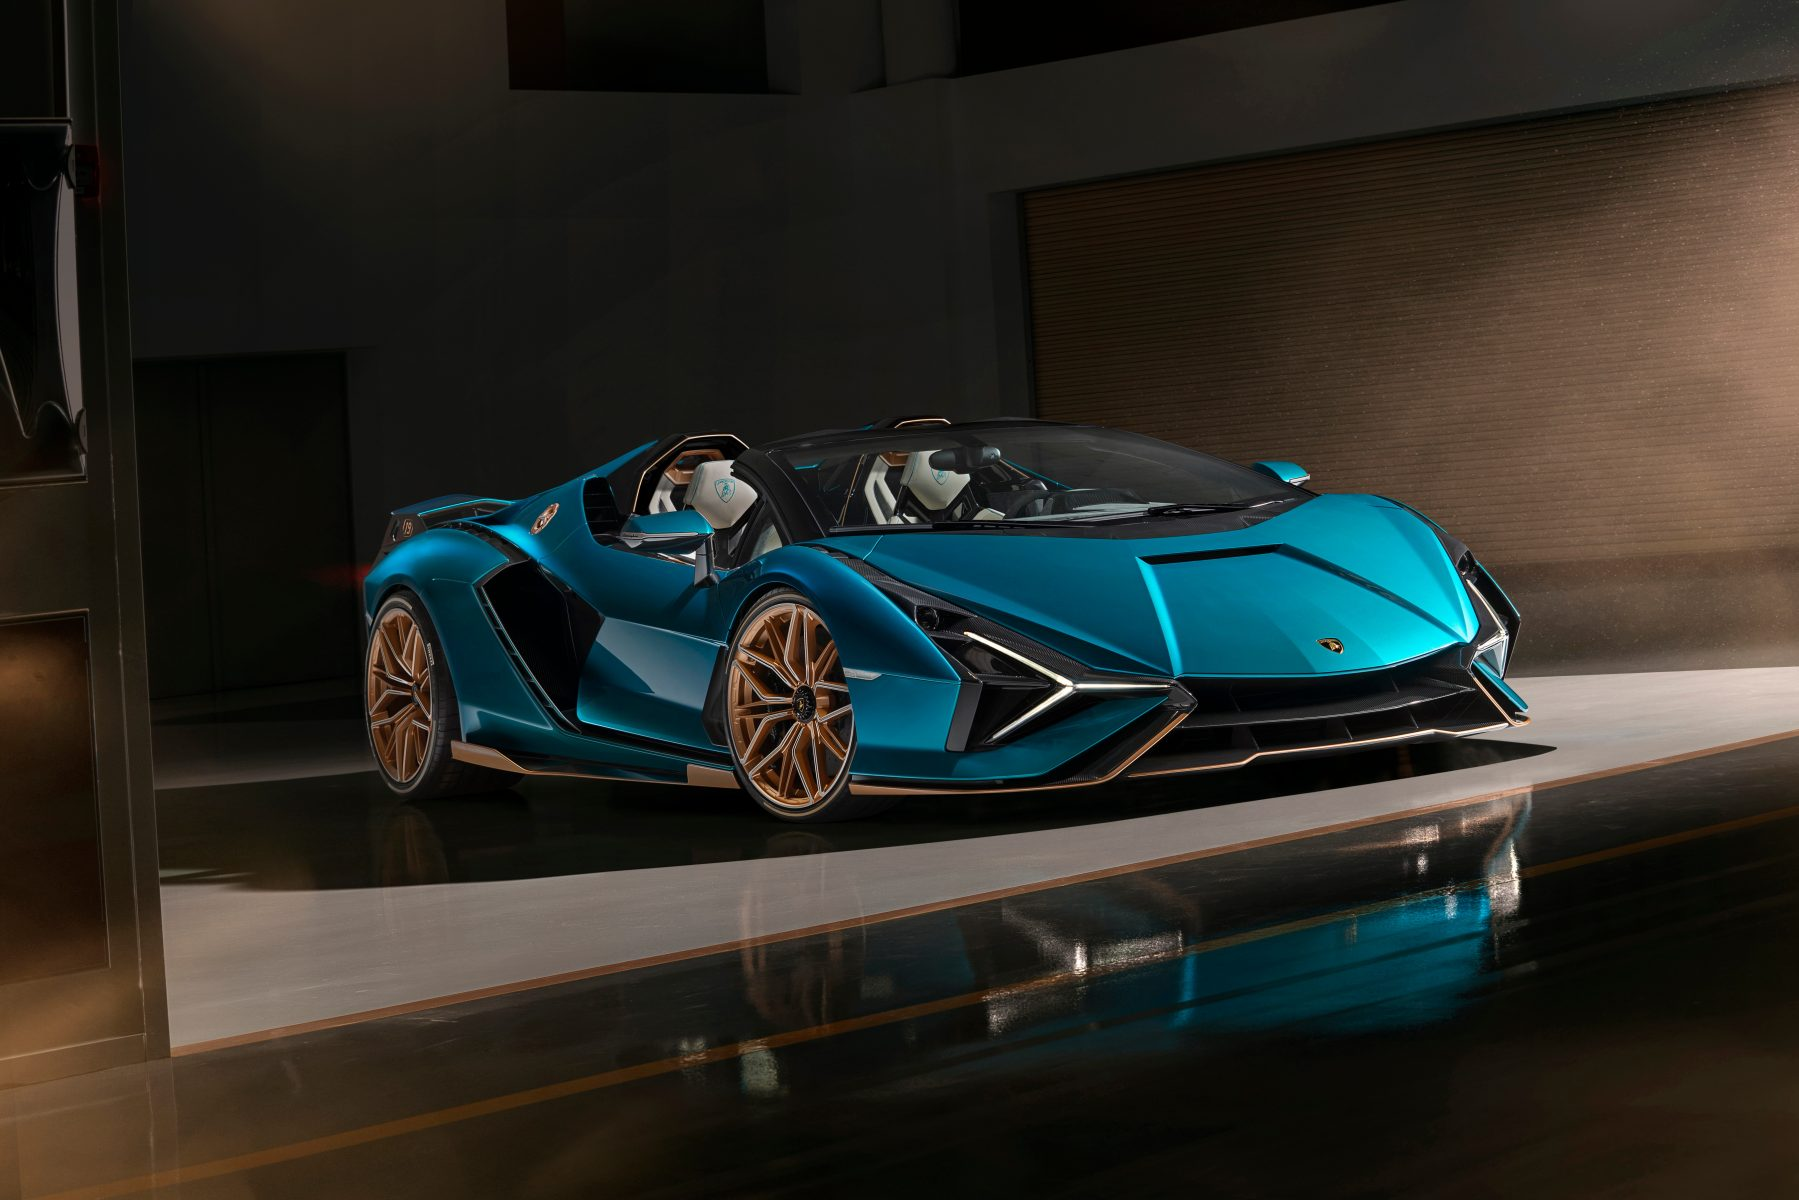 Modelo híbrido Lamborghini Sian Roadster